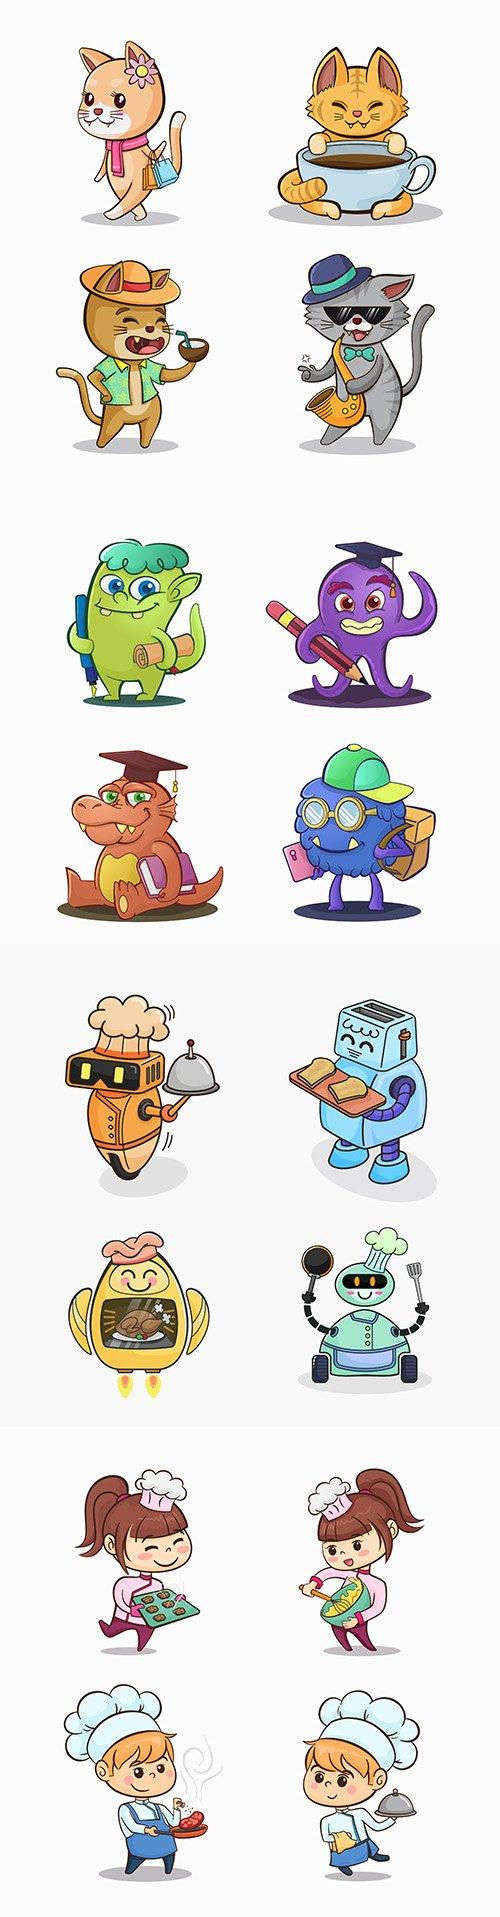 Funny cartoon characters drawn design illustrations